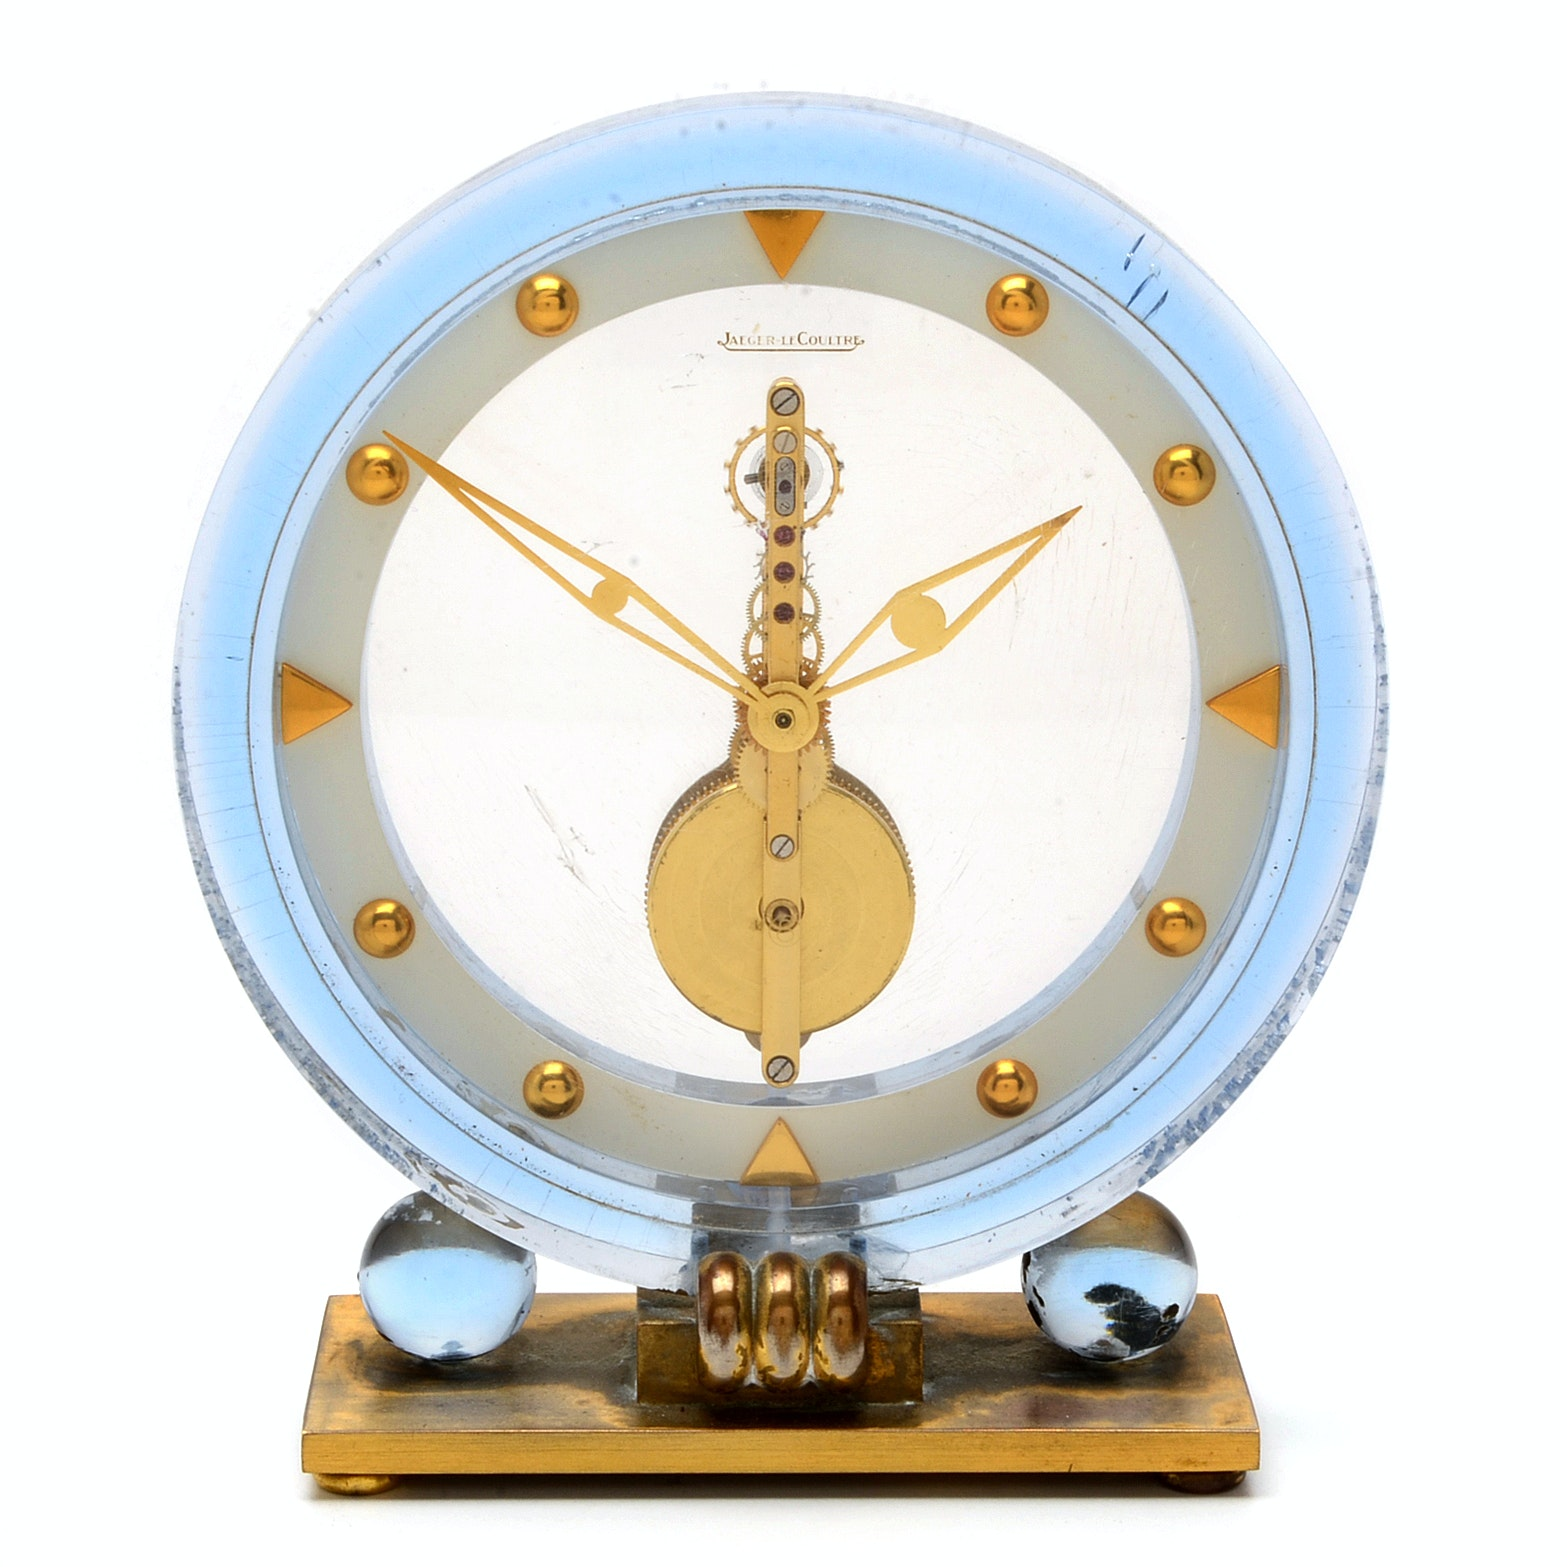 Vintage Jaeger-LeCoultre Round Acrylic Desk Clock